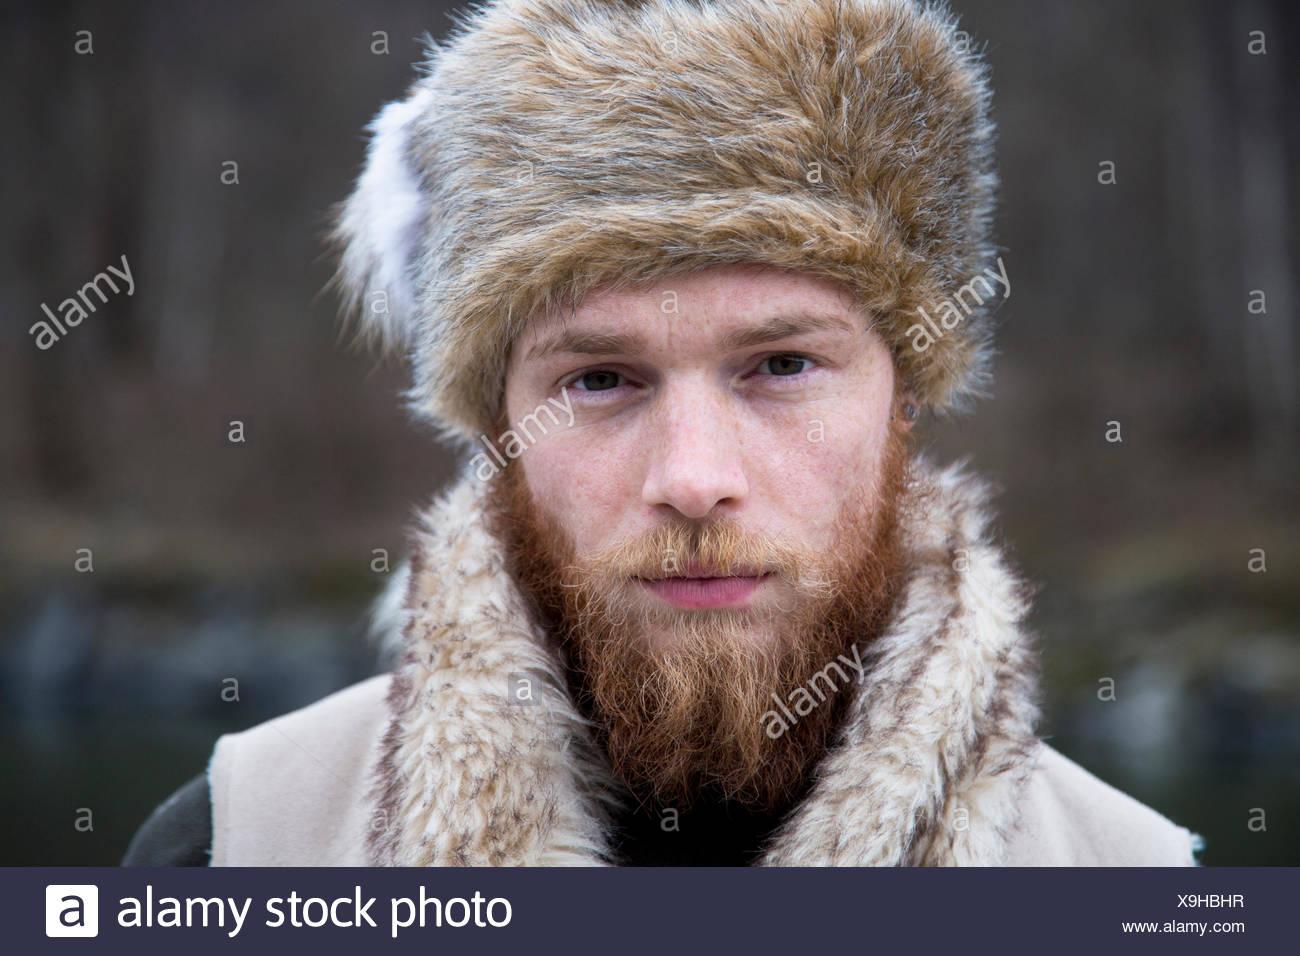 Mid adult man wearing trapper hat e463a6480ebd